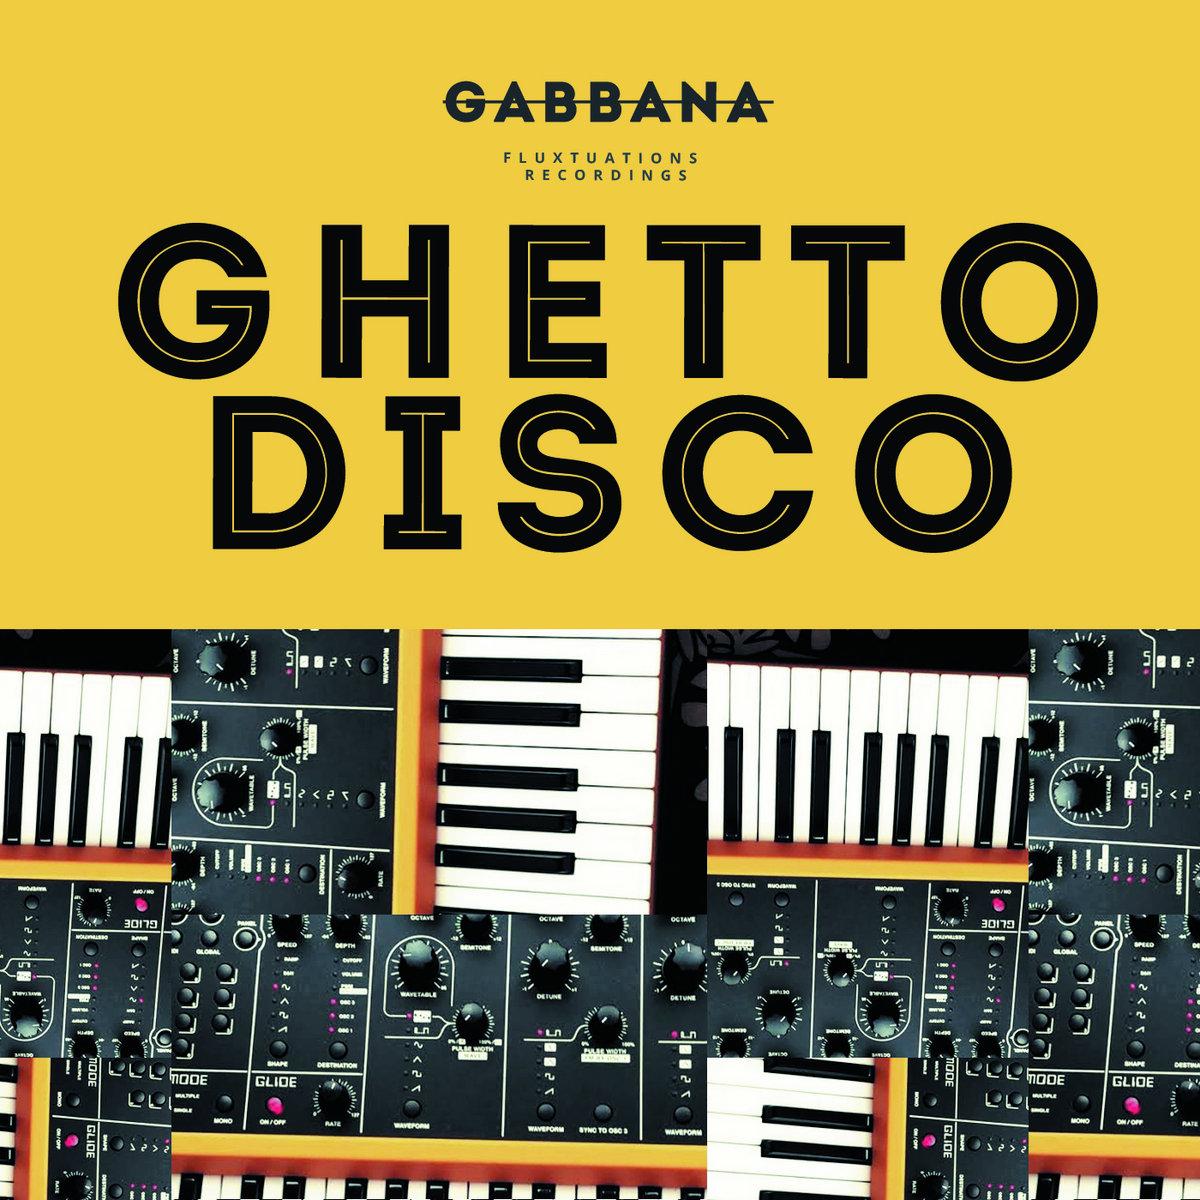 Ghetto Disco (Amapiano Mix) | Gabbana